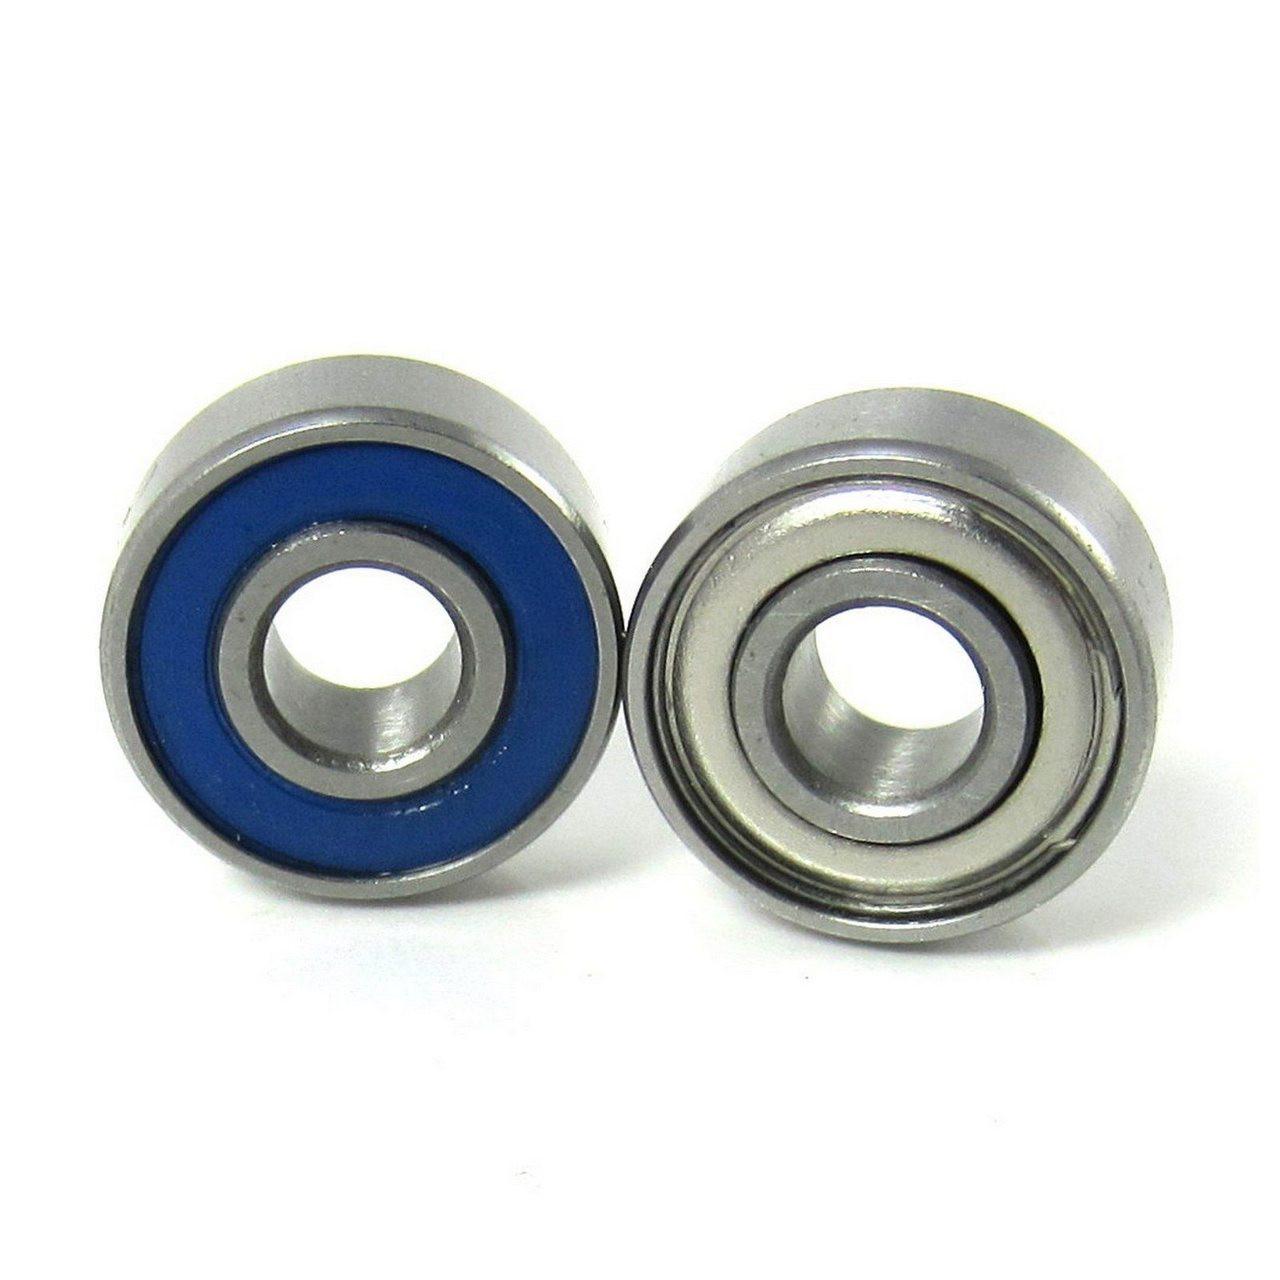 3/16x1/2x49/250 Precision Ball Bearings ABEC 5 Hybrid Seals (2)